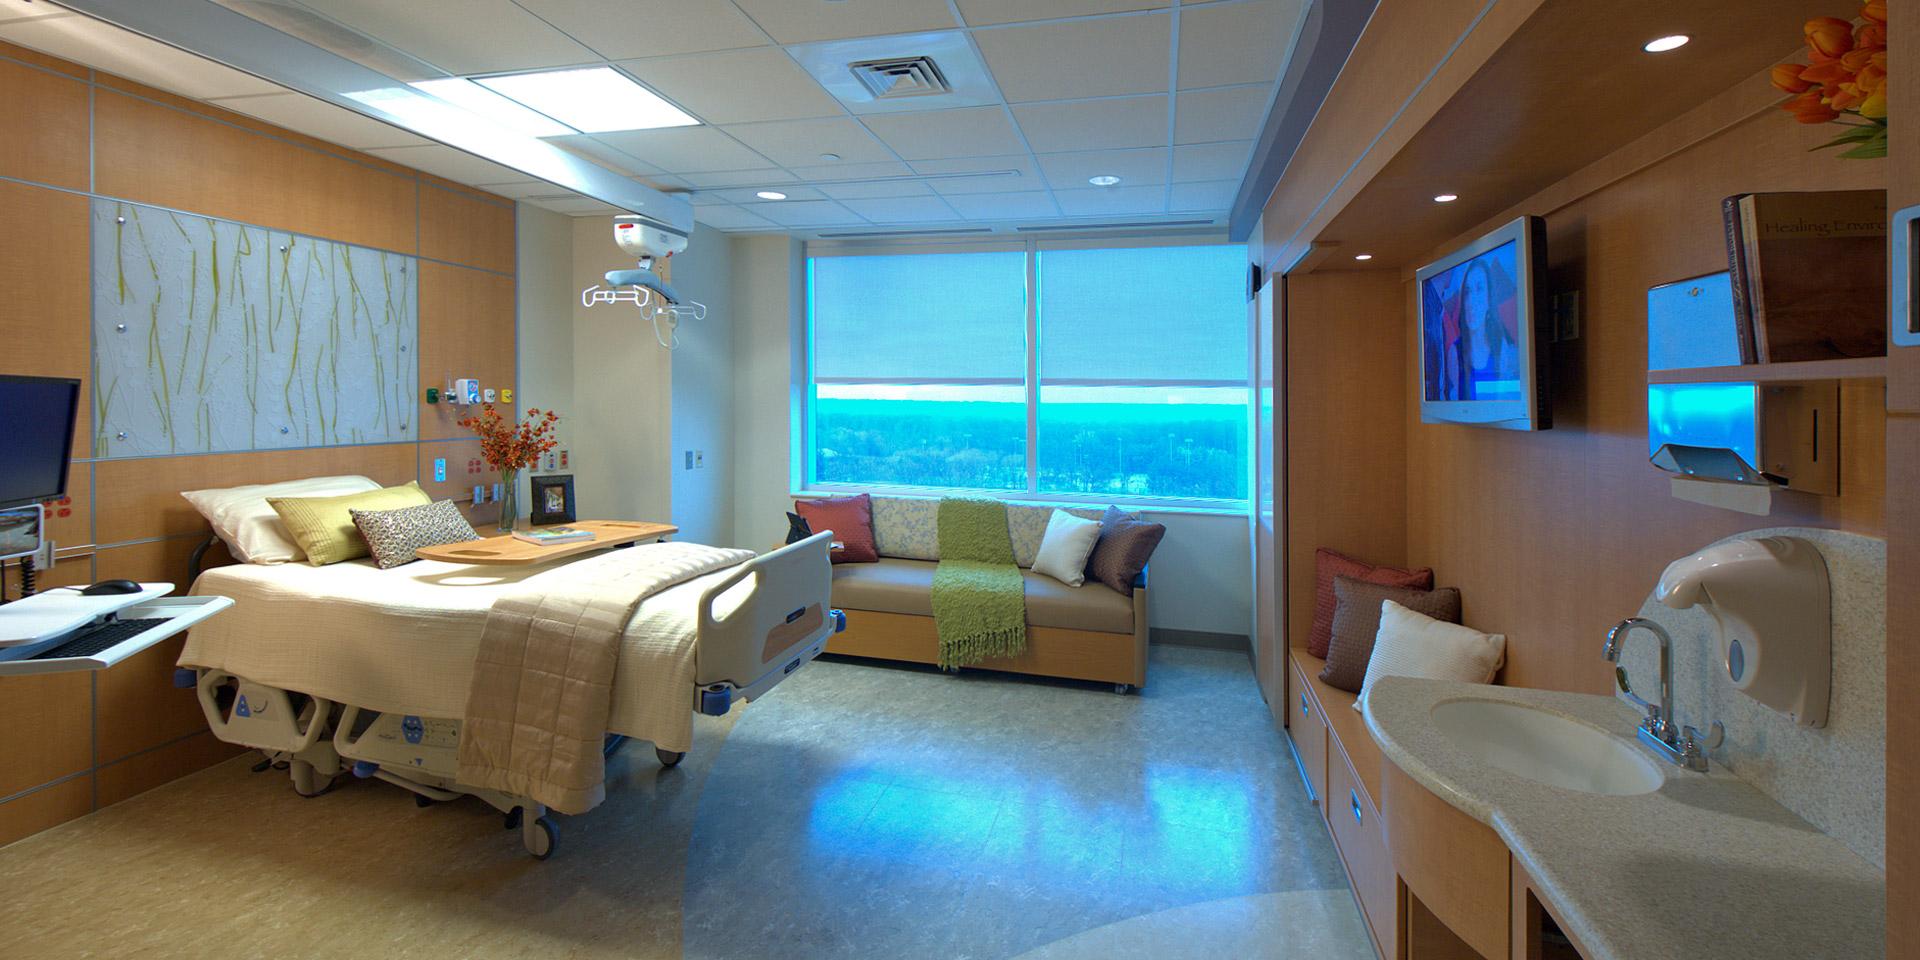 Inova Fairfax Hospital Bed Modernization ...